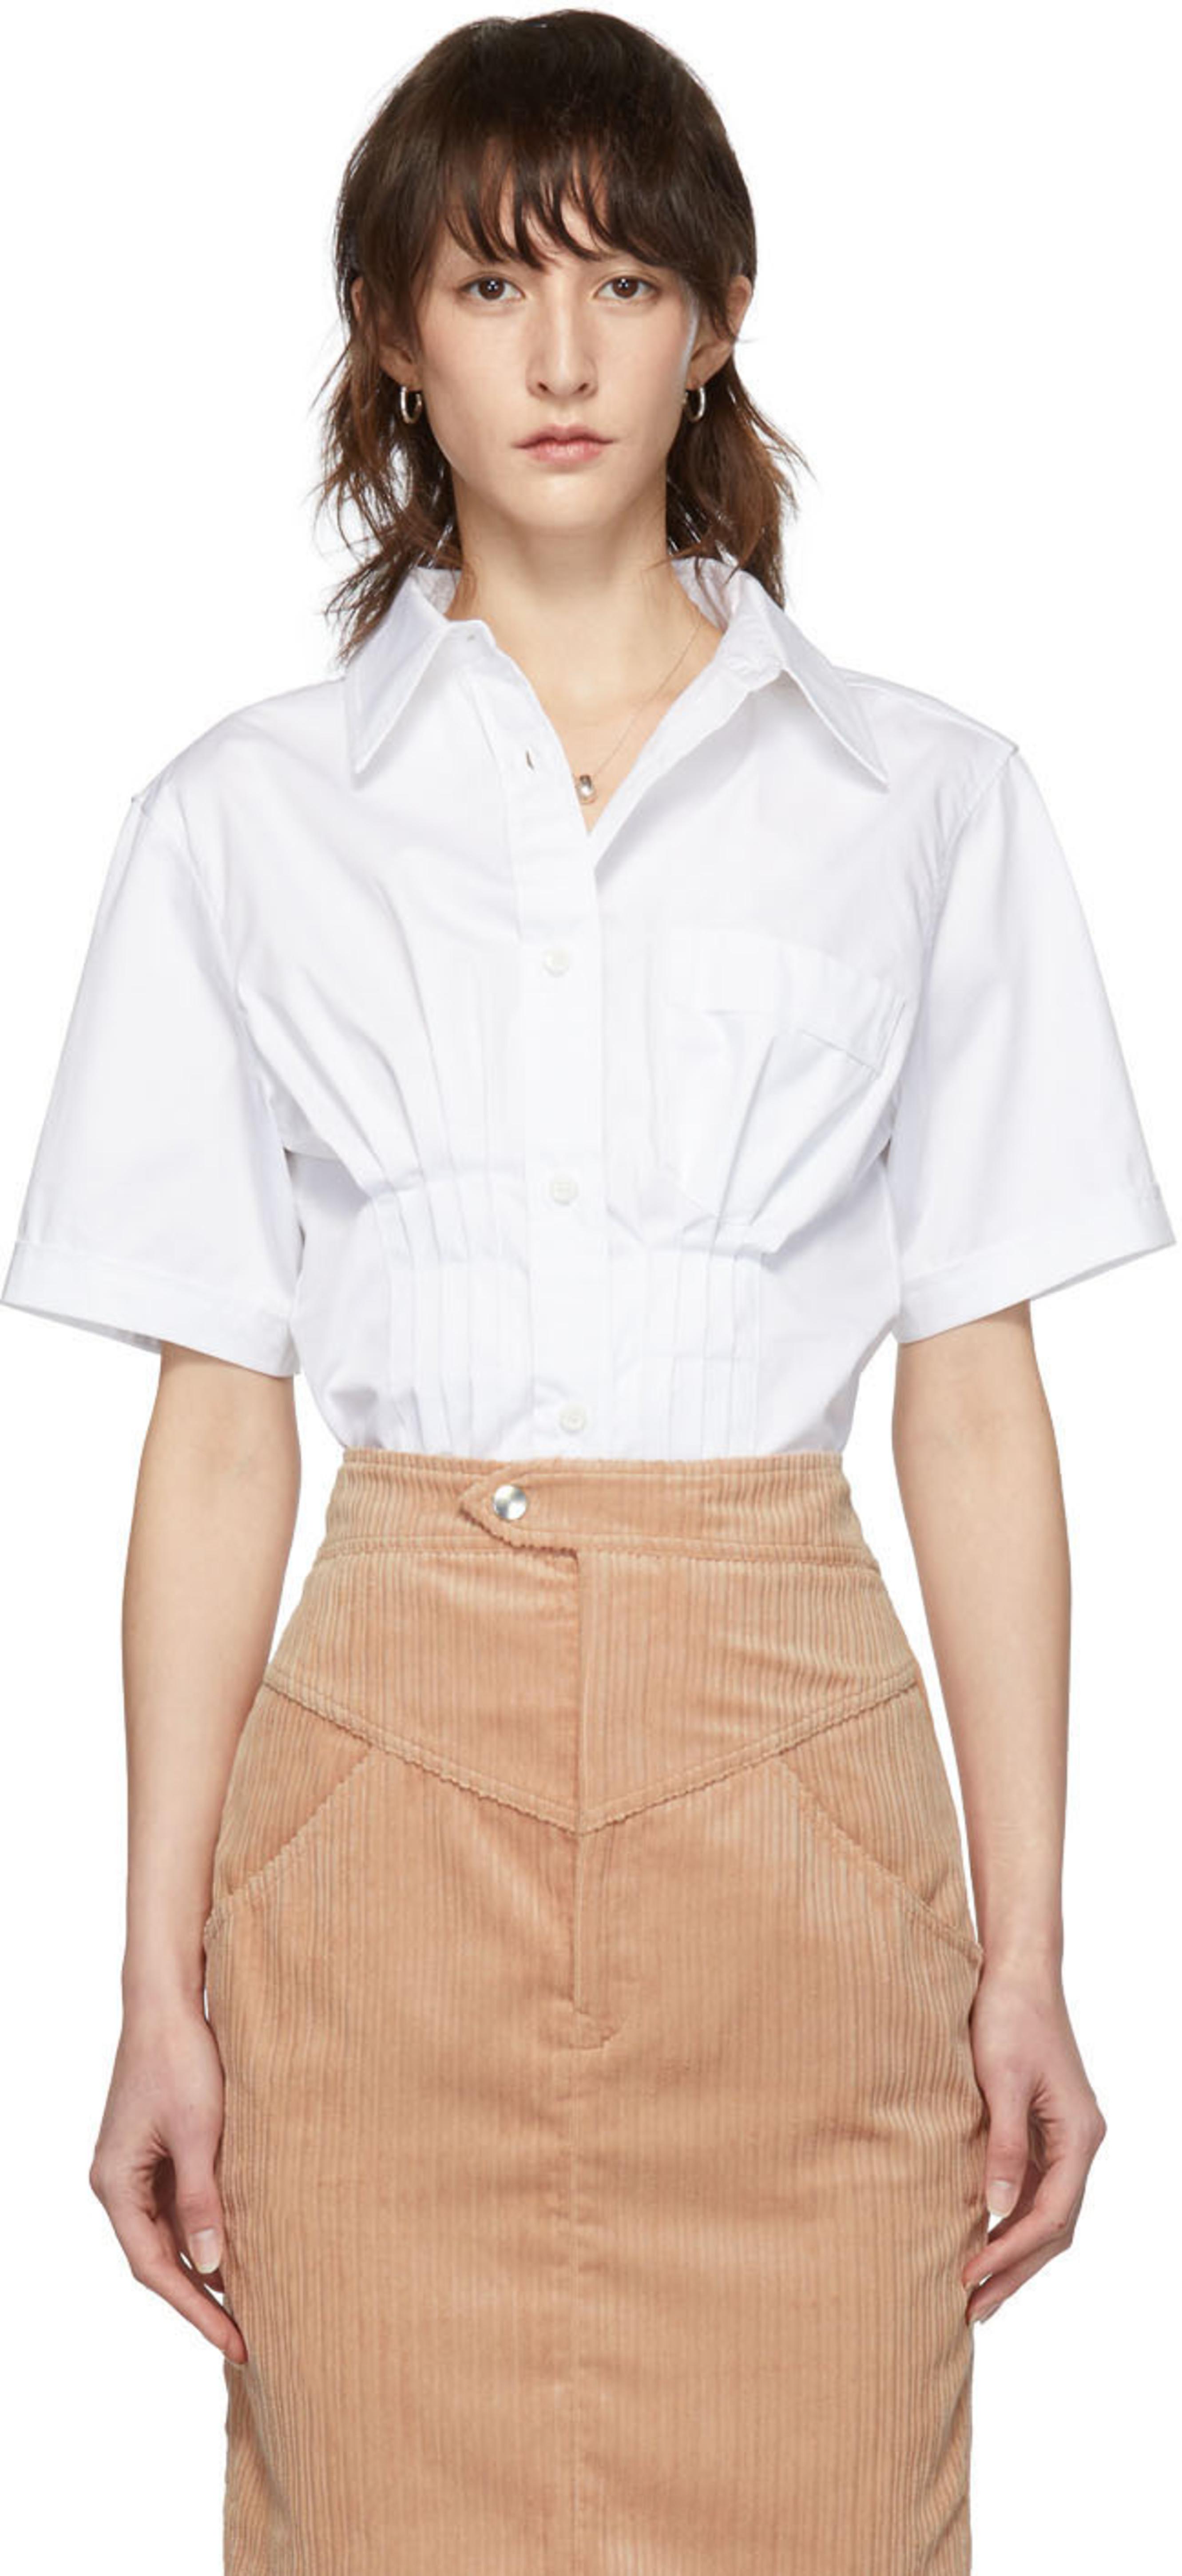 309e443679c05 Designer shirts for Women